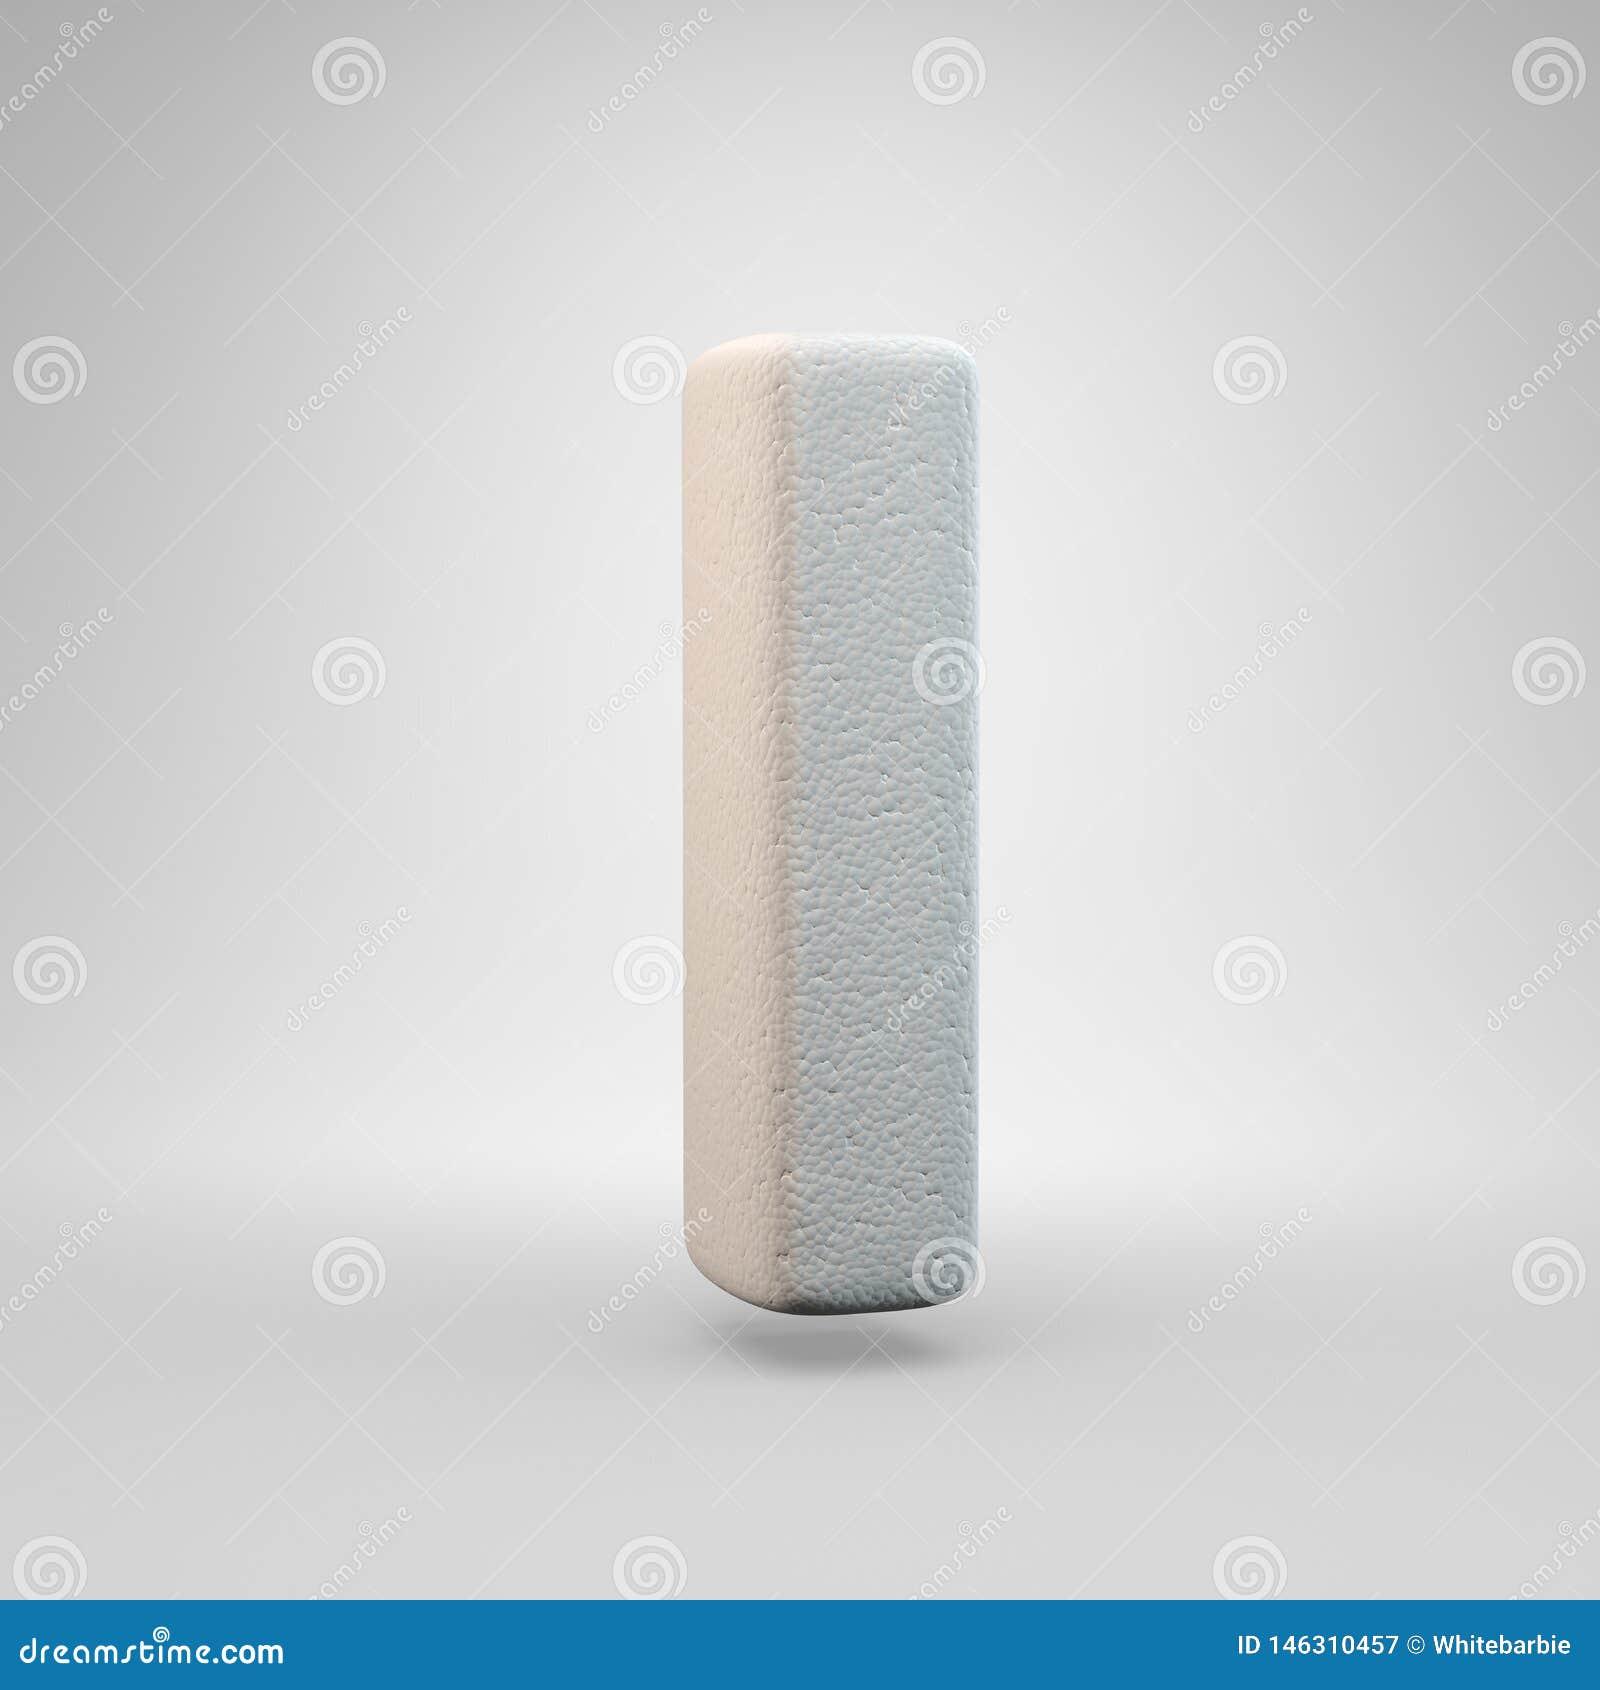 Volumetric construction foam uppercase letter I isolated on white background